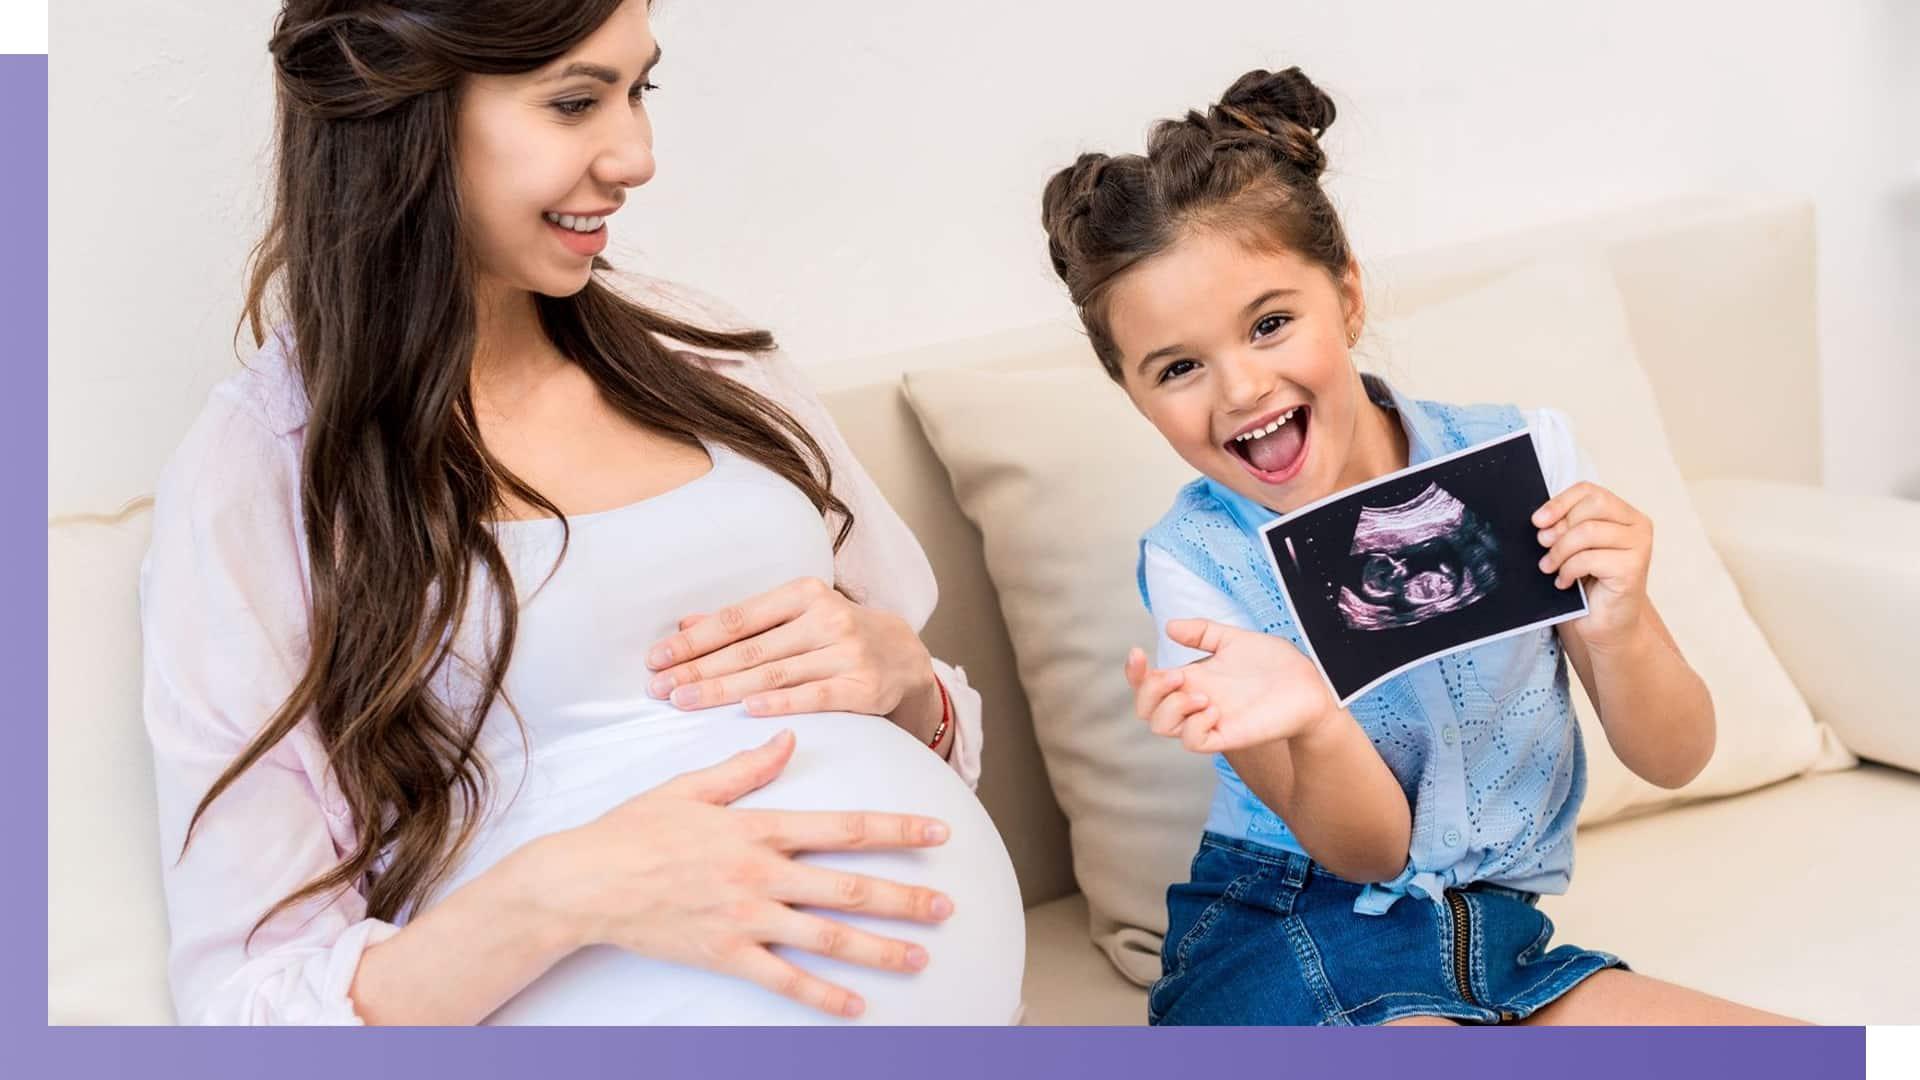 embryo vitrification